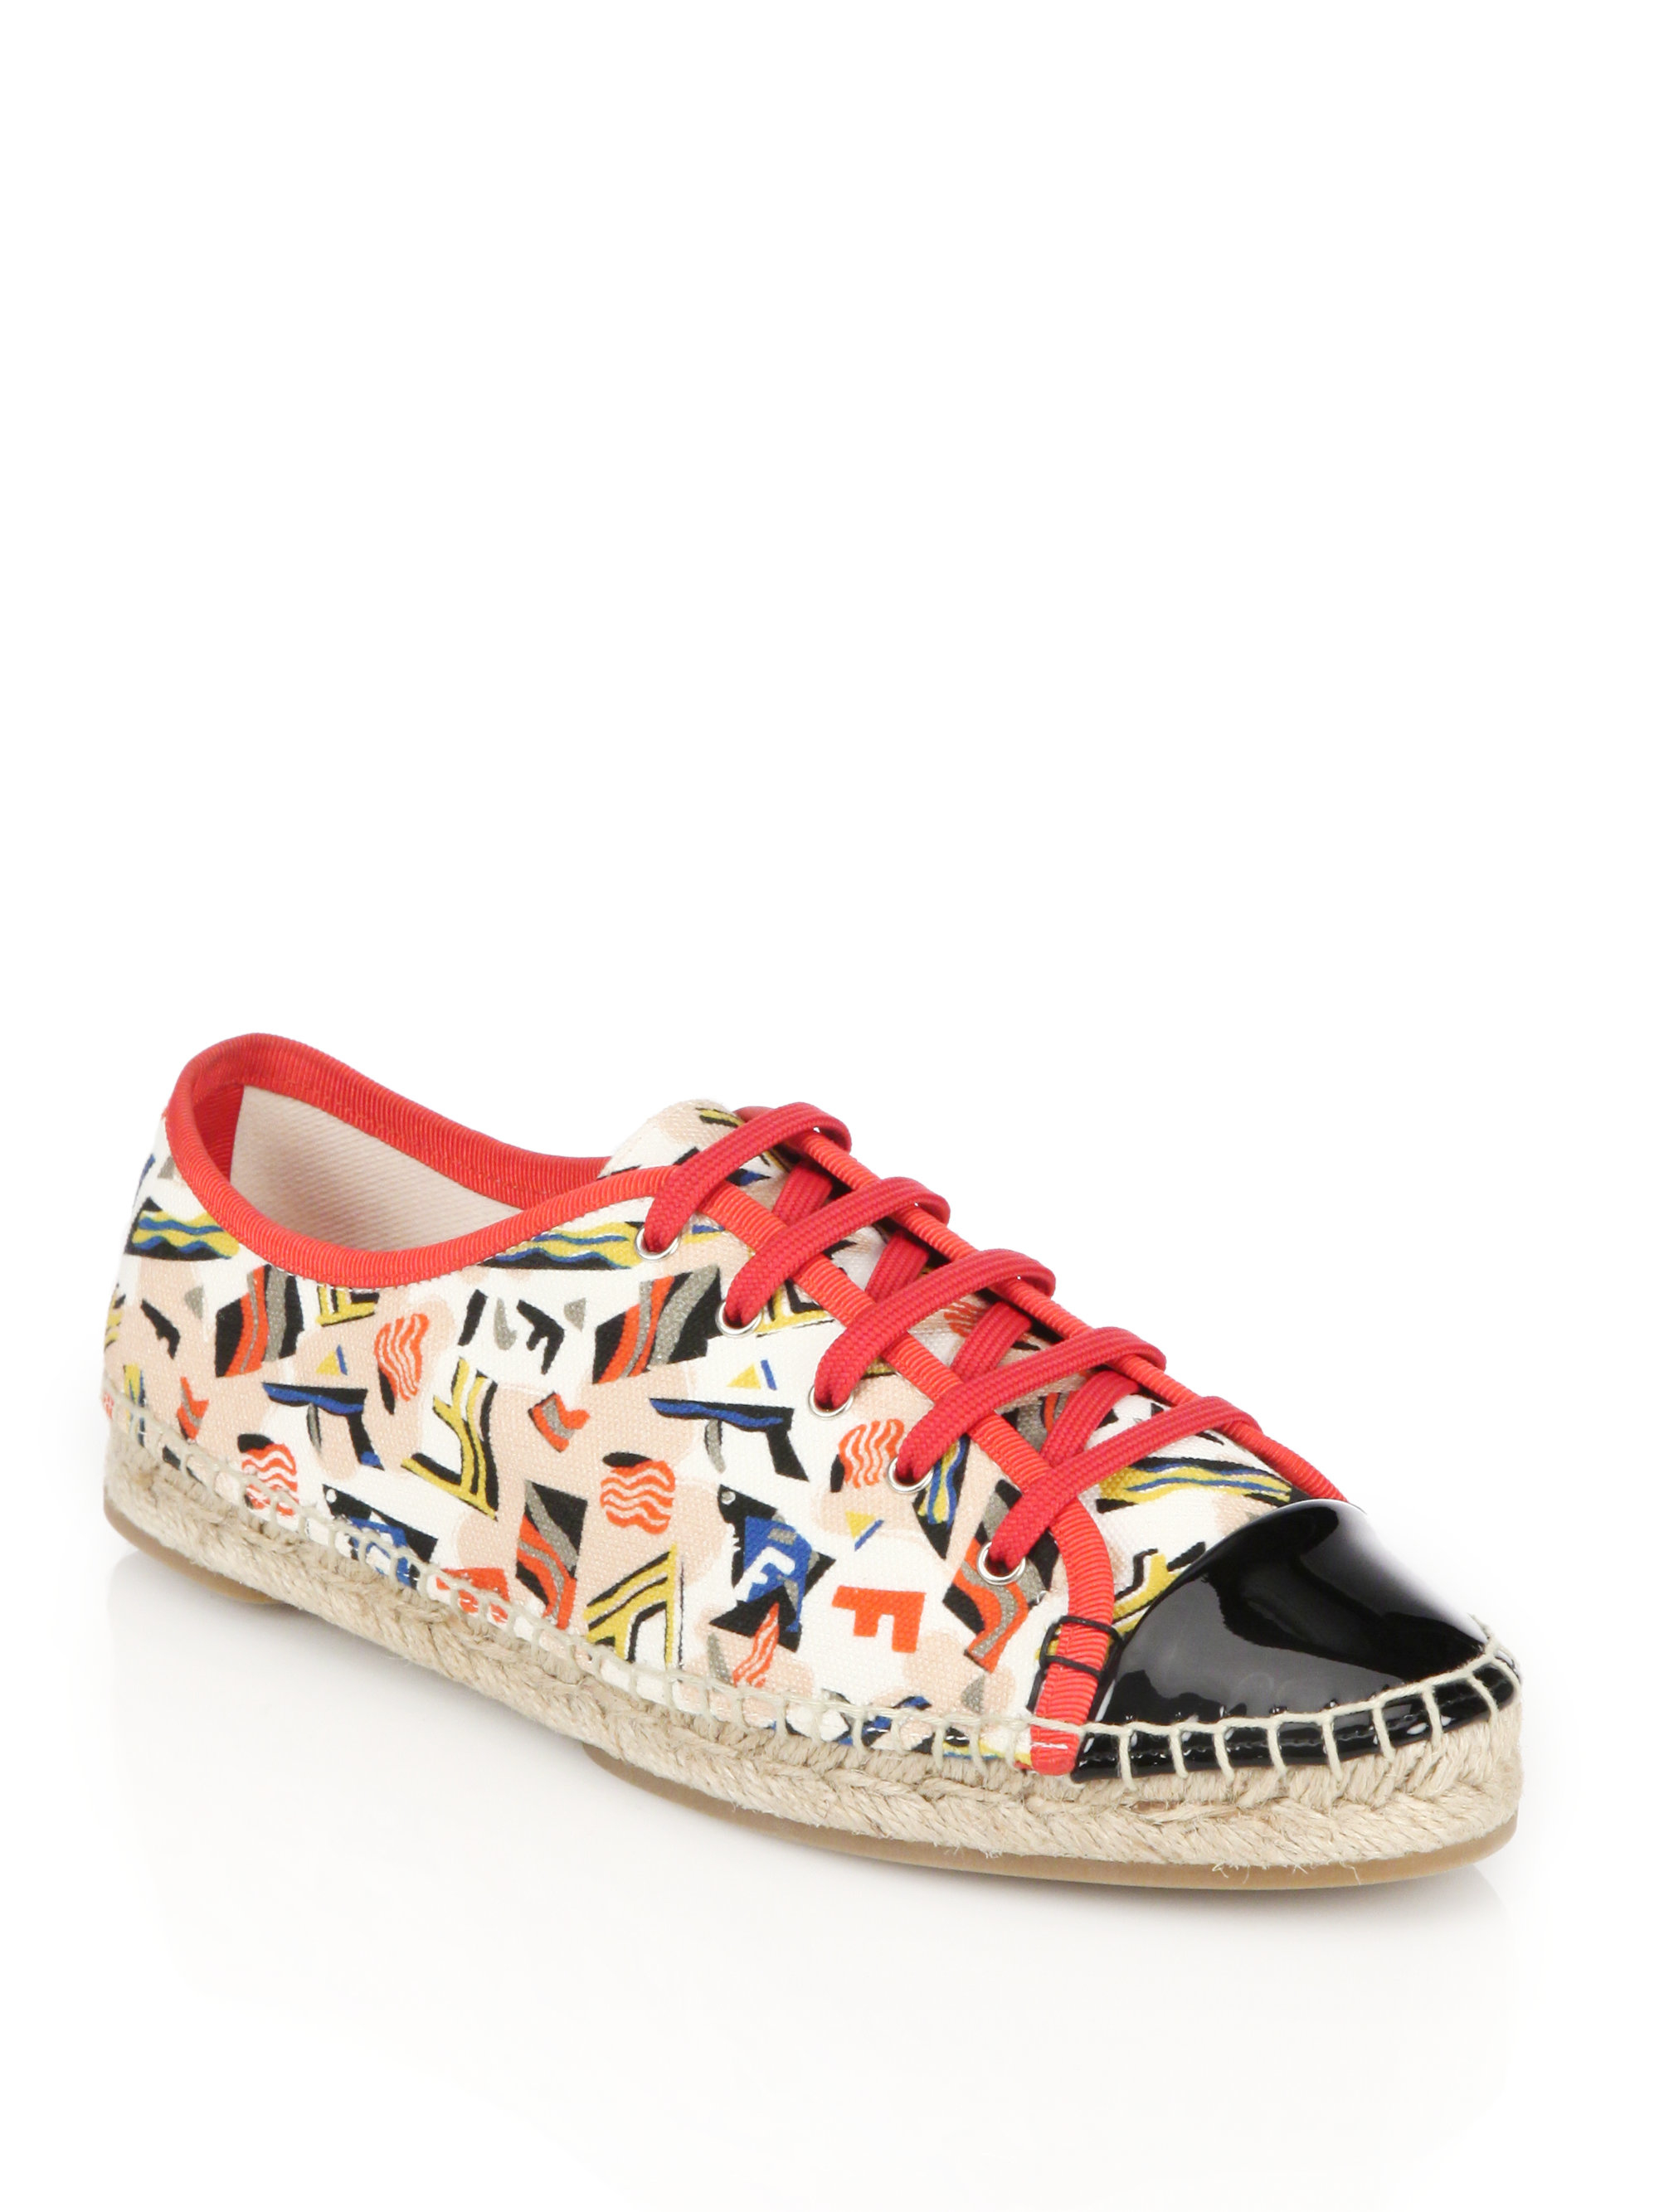 Fendi Junia Canvas Sneakers